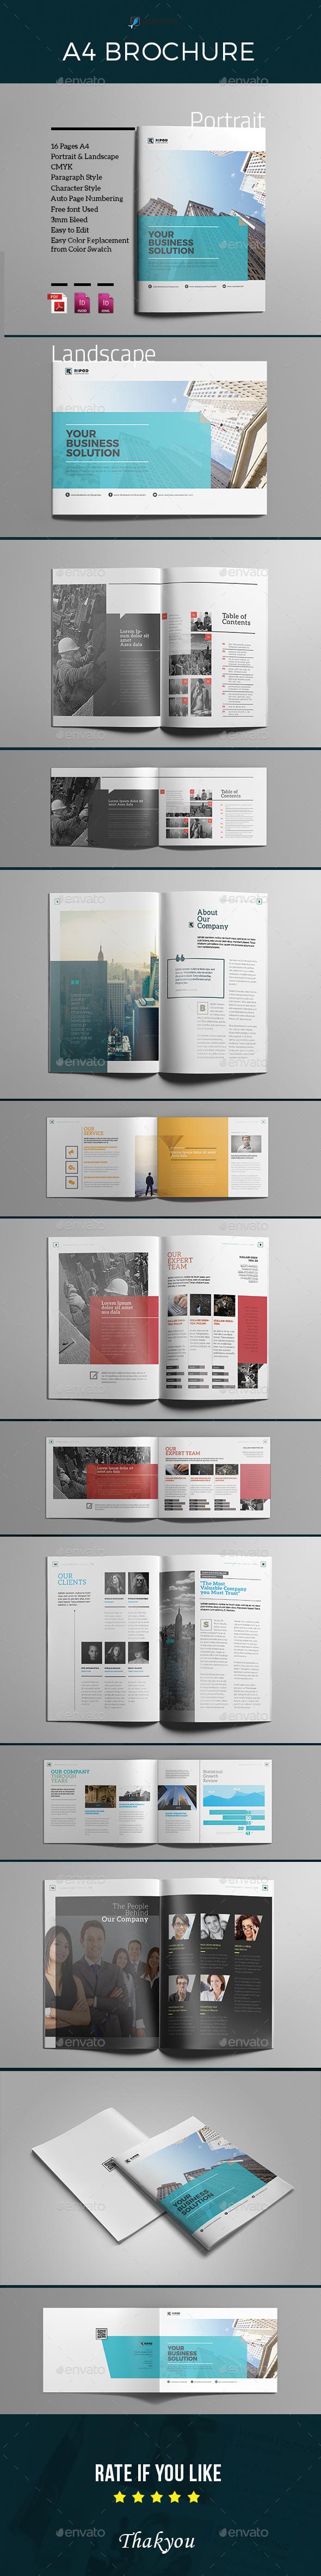 A4 Indesign Brochure - Corporate Brochures